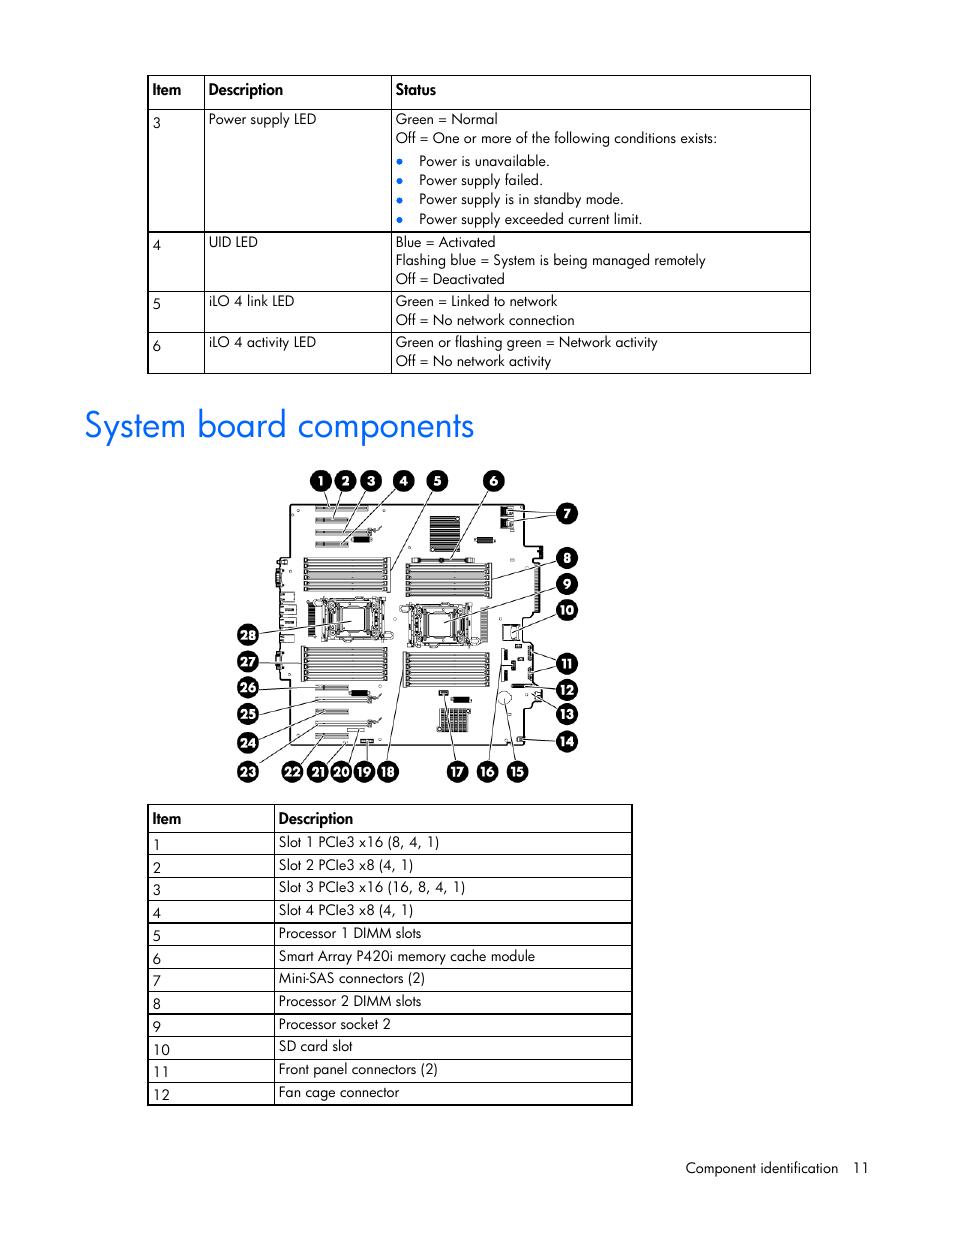 System board components | HP ProLiant ML350p Gen8 Server